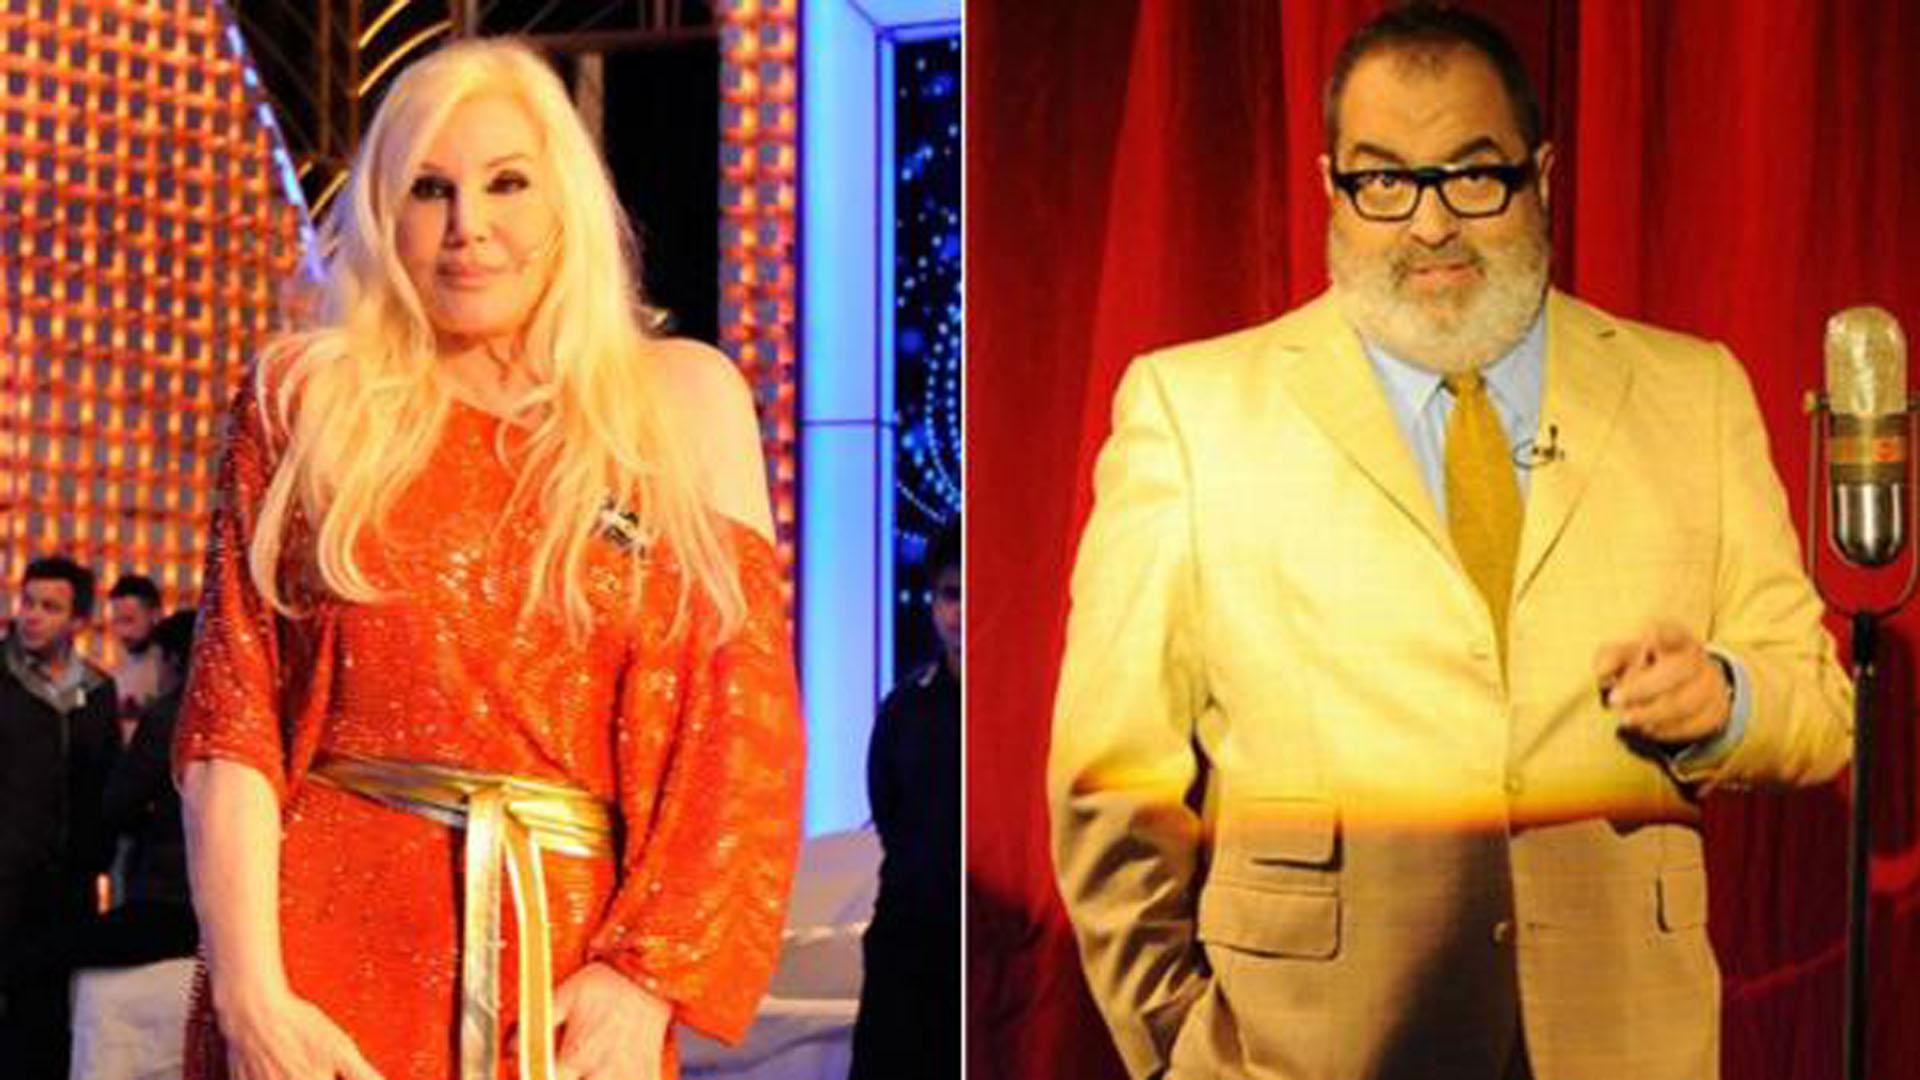 Susana Giménez y Jorge Lanata